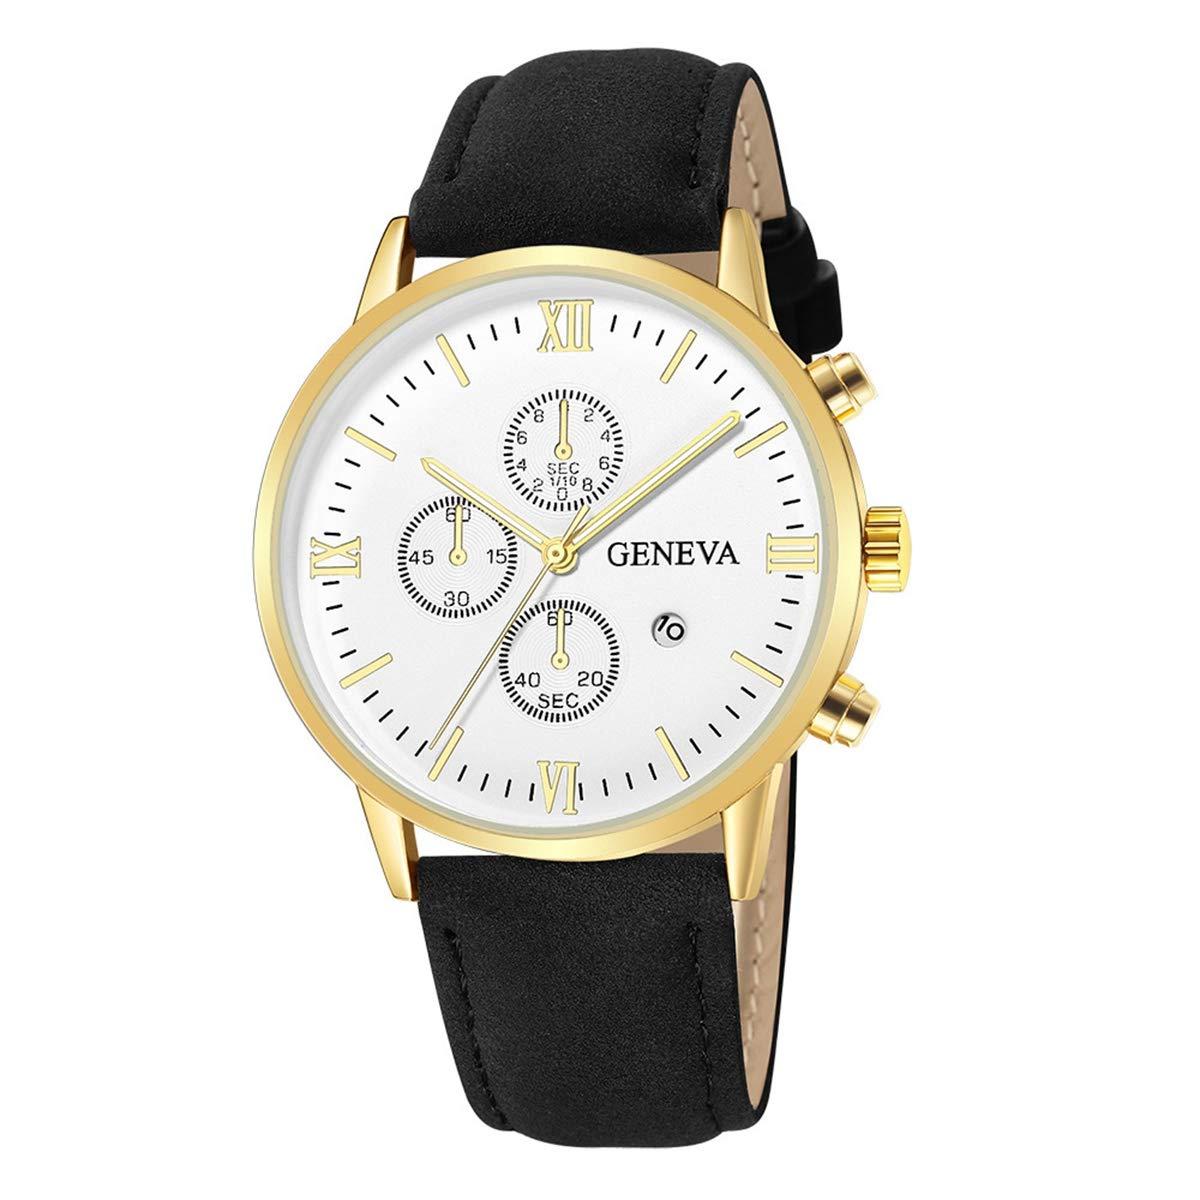 ZODRQ Men's Watch,Fashion Life Waterproof Sport Watches Leather Band Wrist Watch Wristwatch Date Quartz Watch for Men Gift (P) by ZODRQ